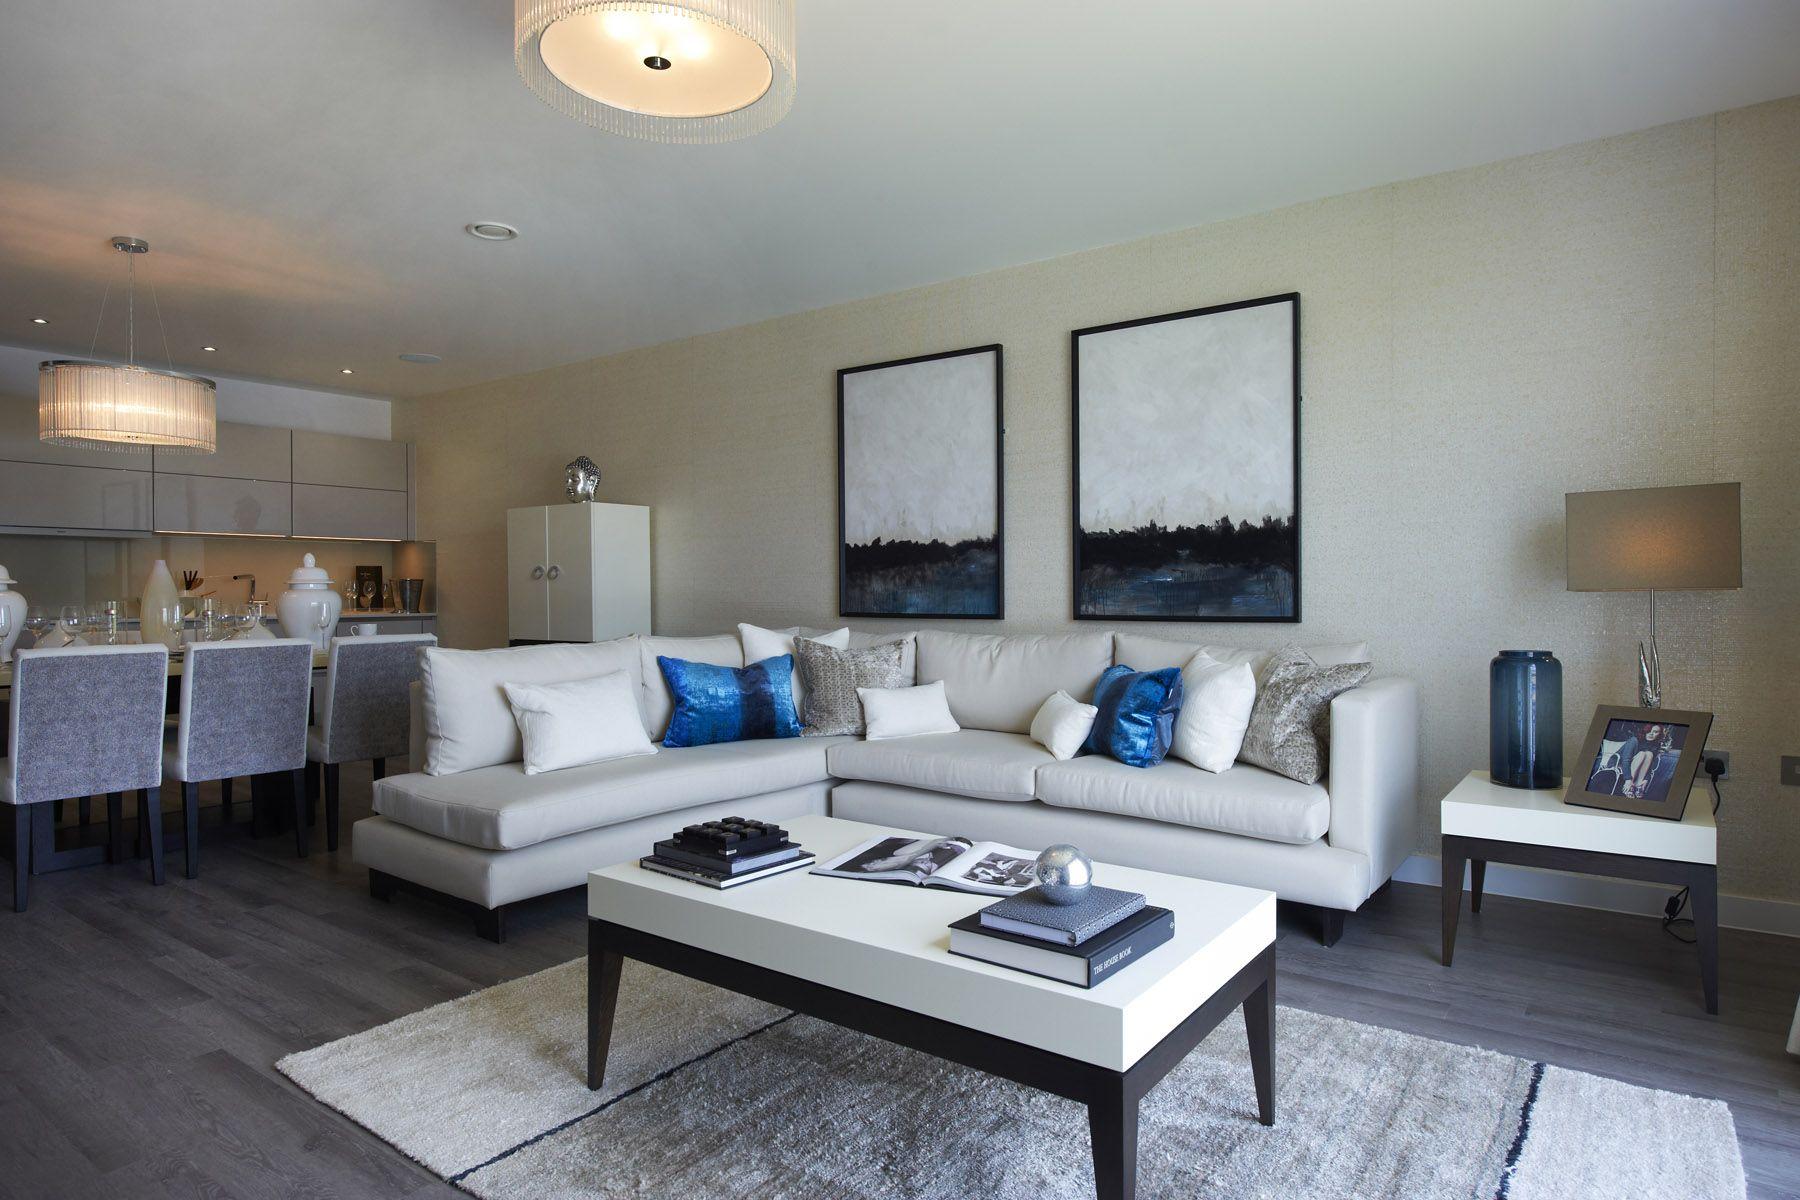 living room design 2015 uk simple house interior design